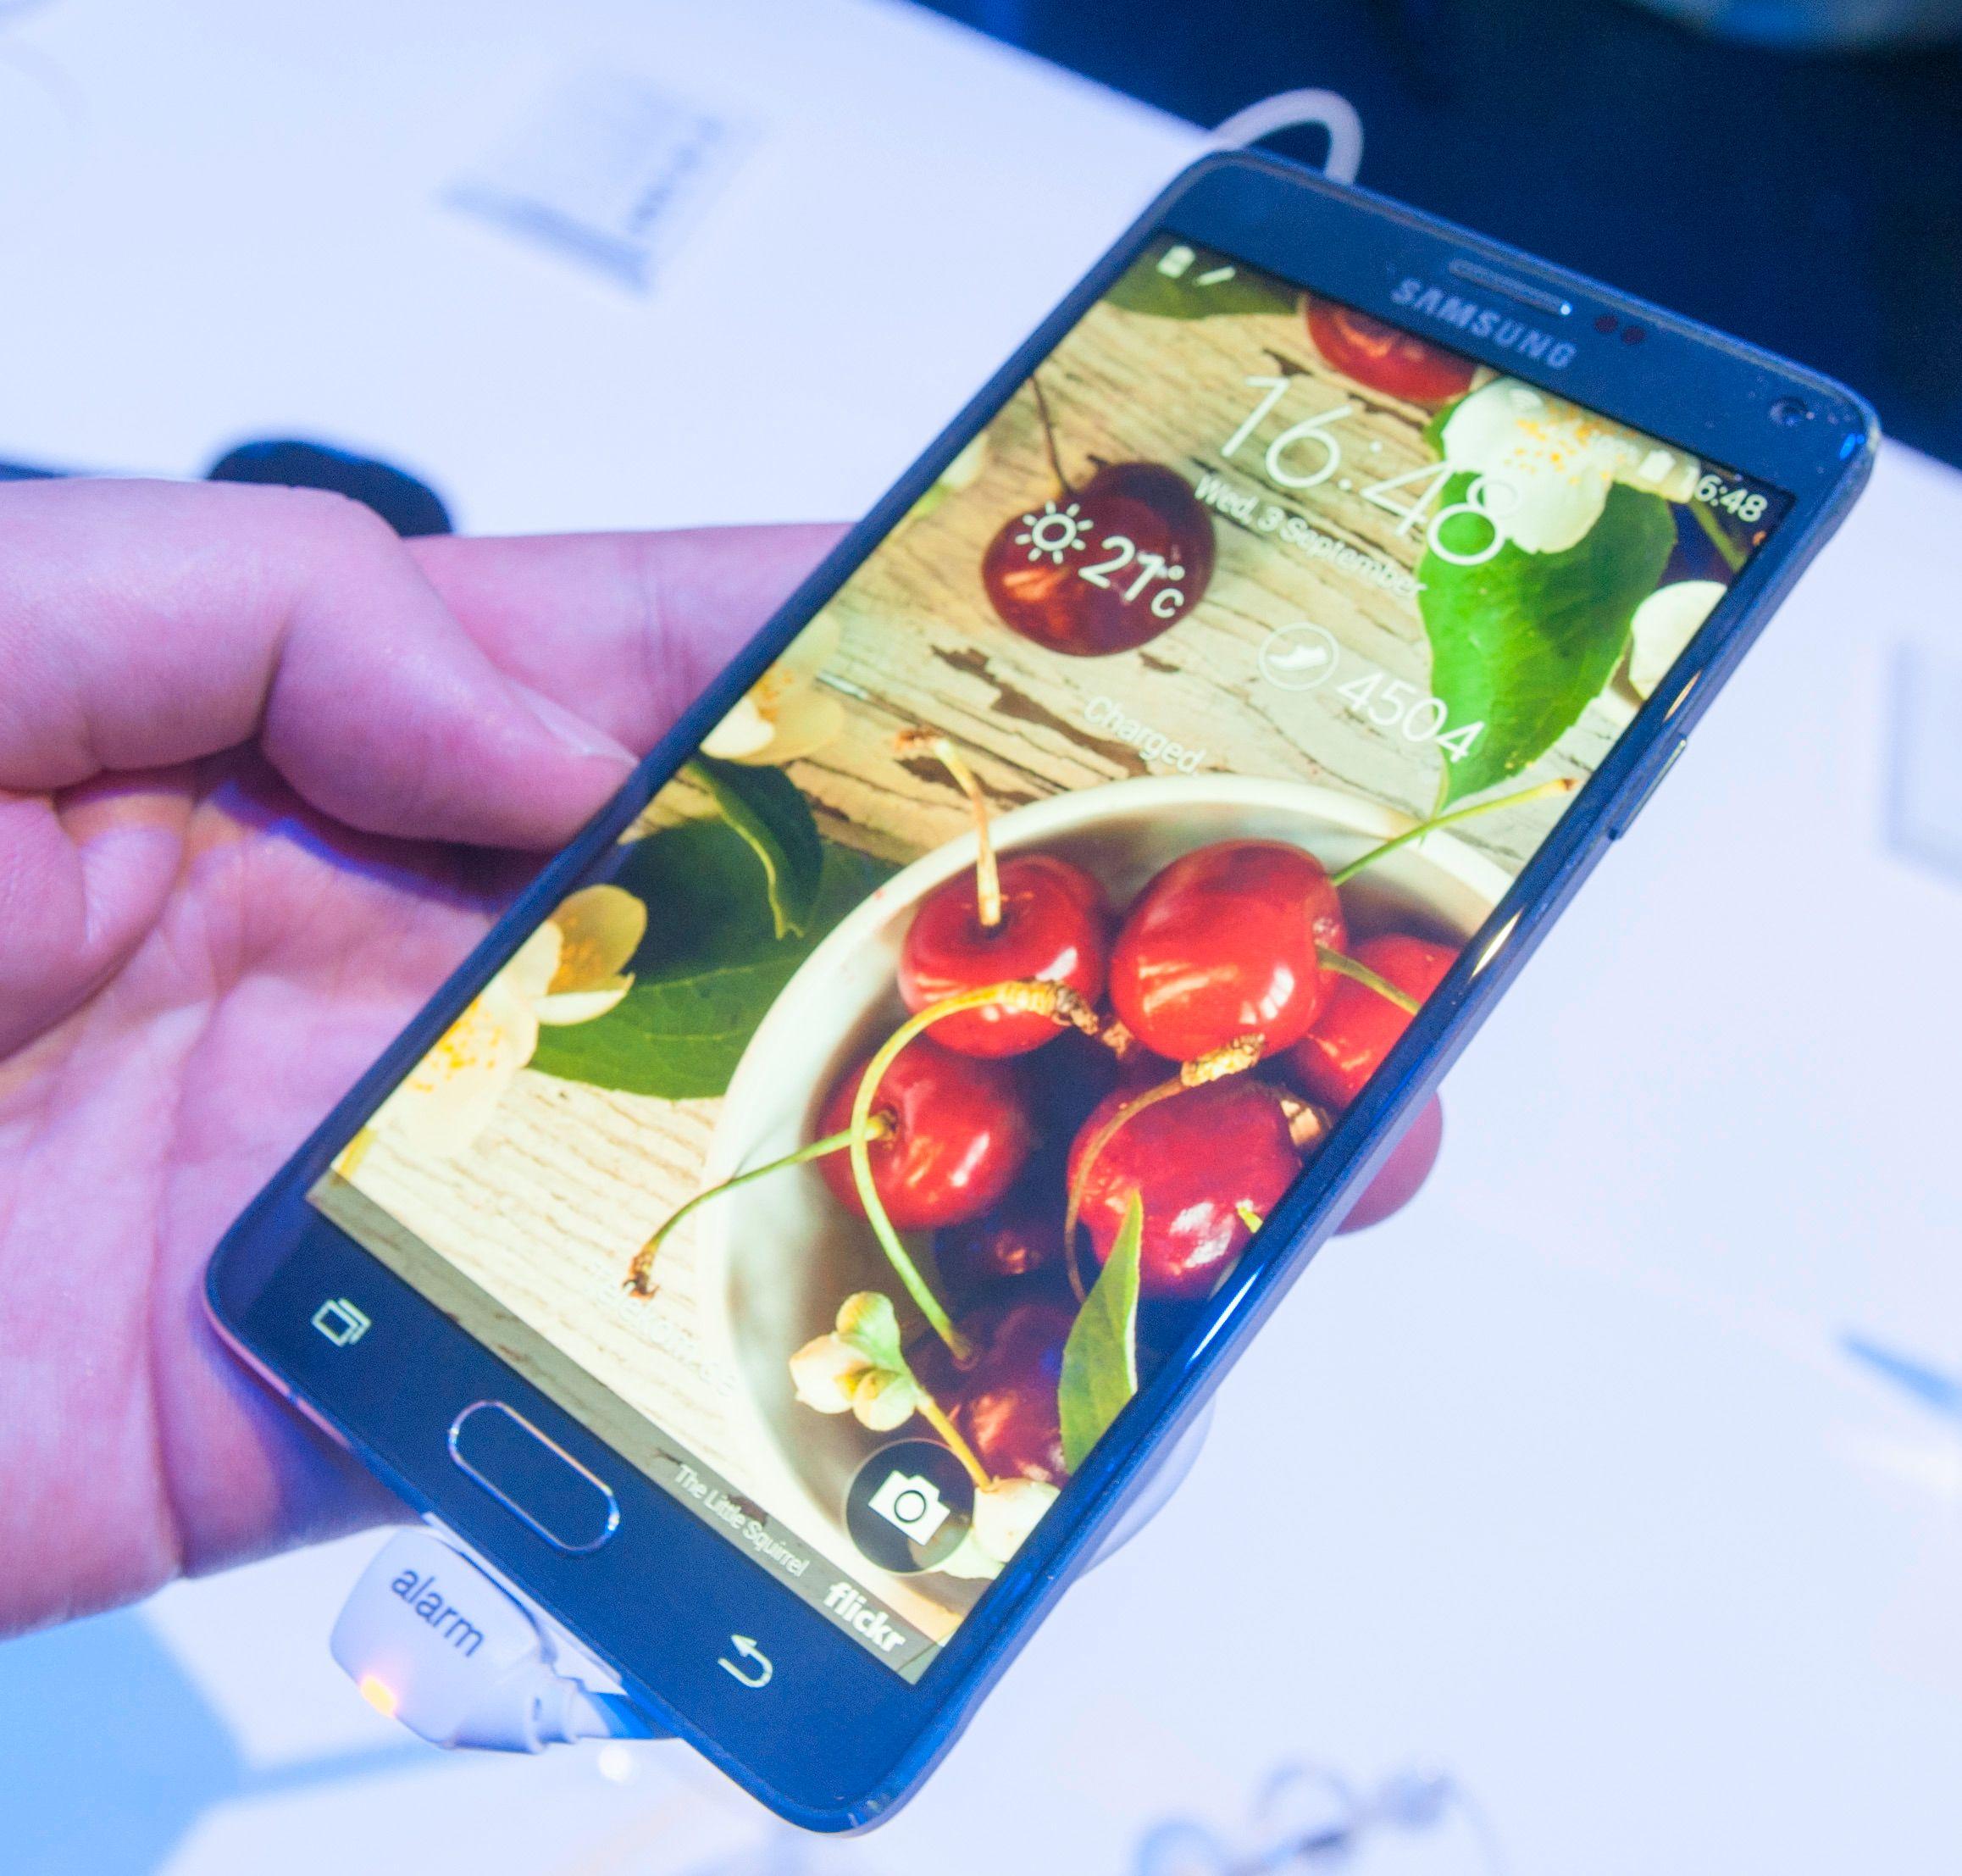 Analytikerne nedjusterer forventningene, samtidig er Samsungs Galaxy Note 4 utsolgt på det sør-koreanske forhåndssalget.Foto: Finn Jarle Kvalheim, Tek.no